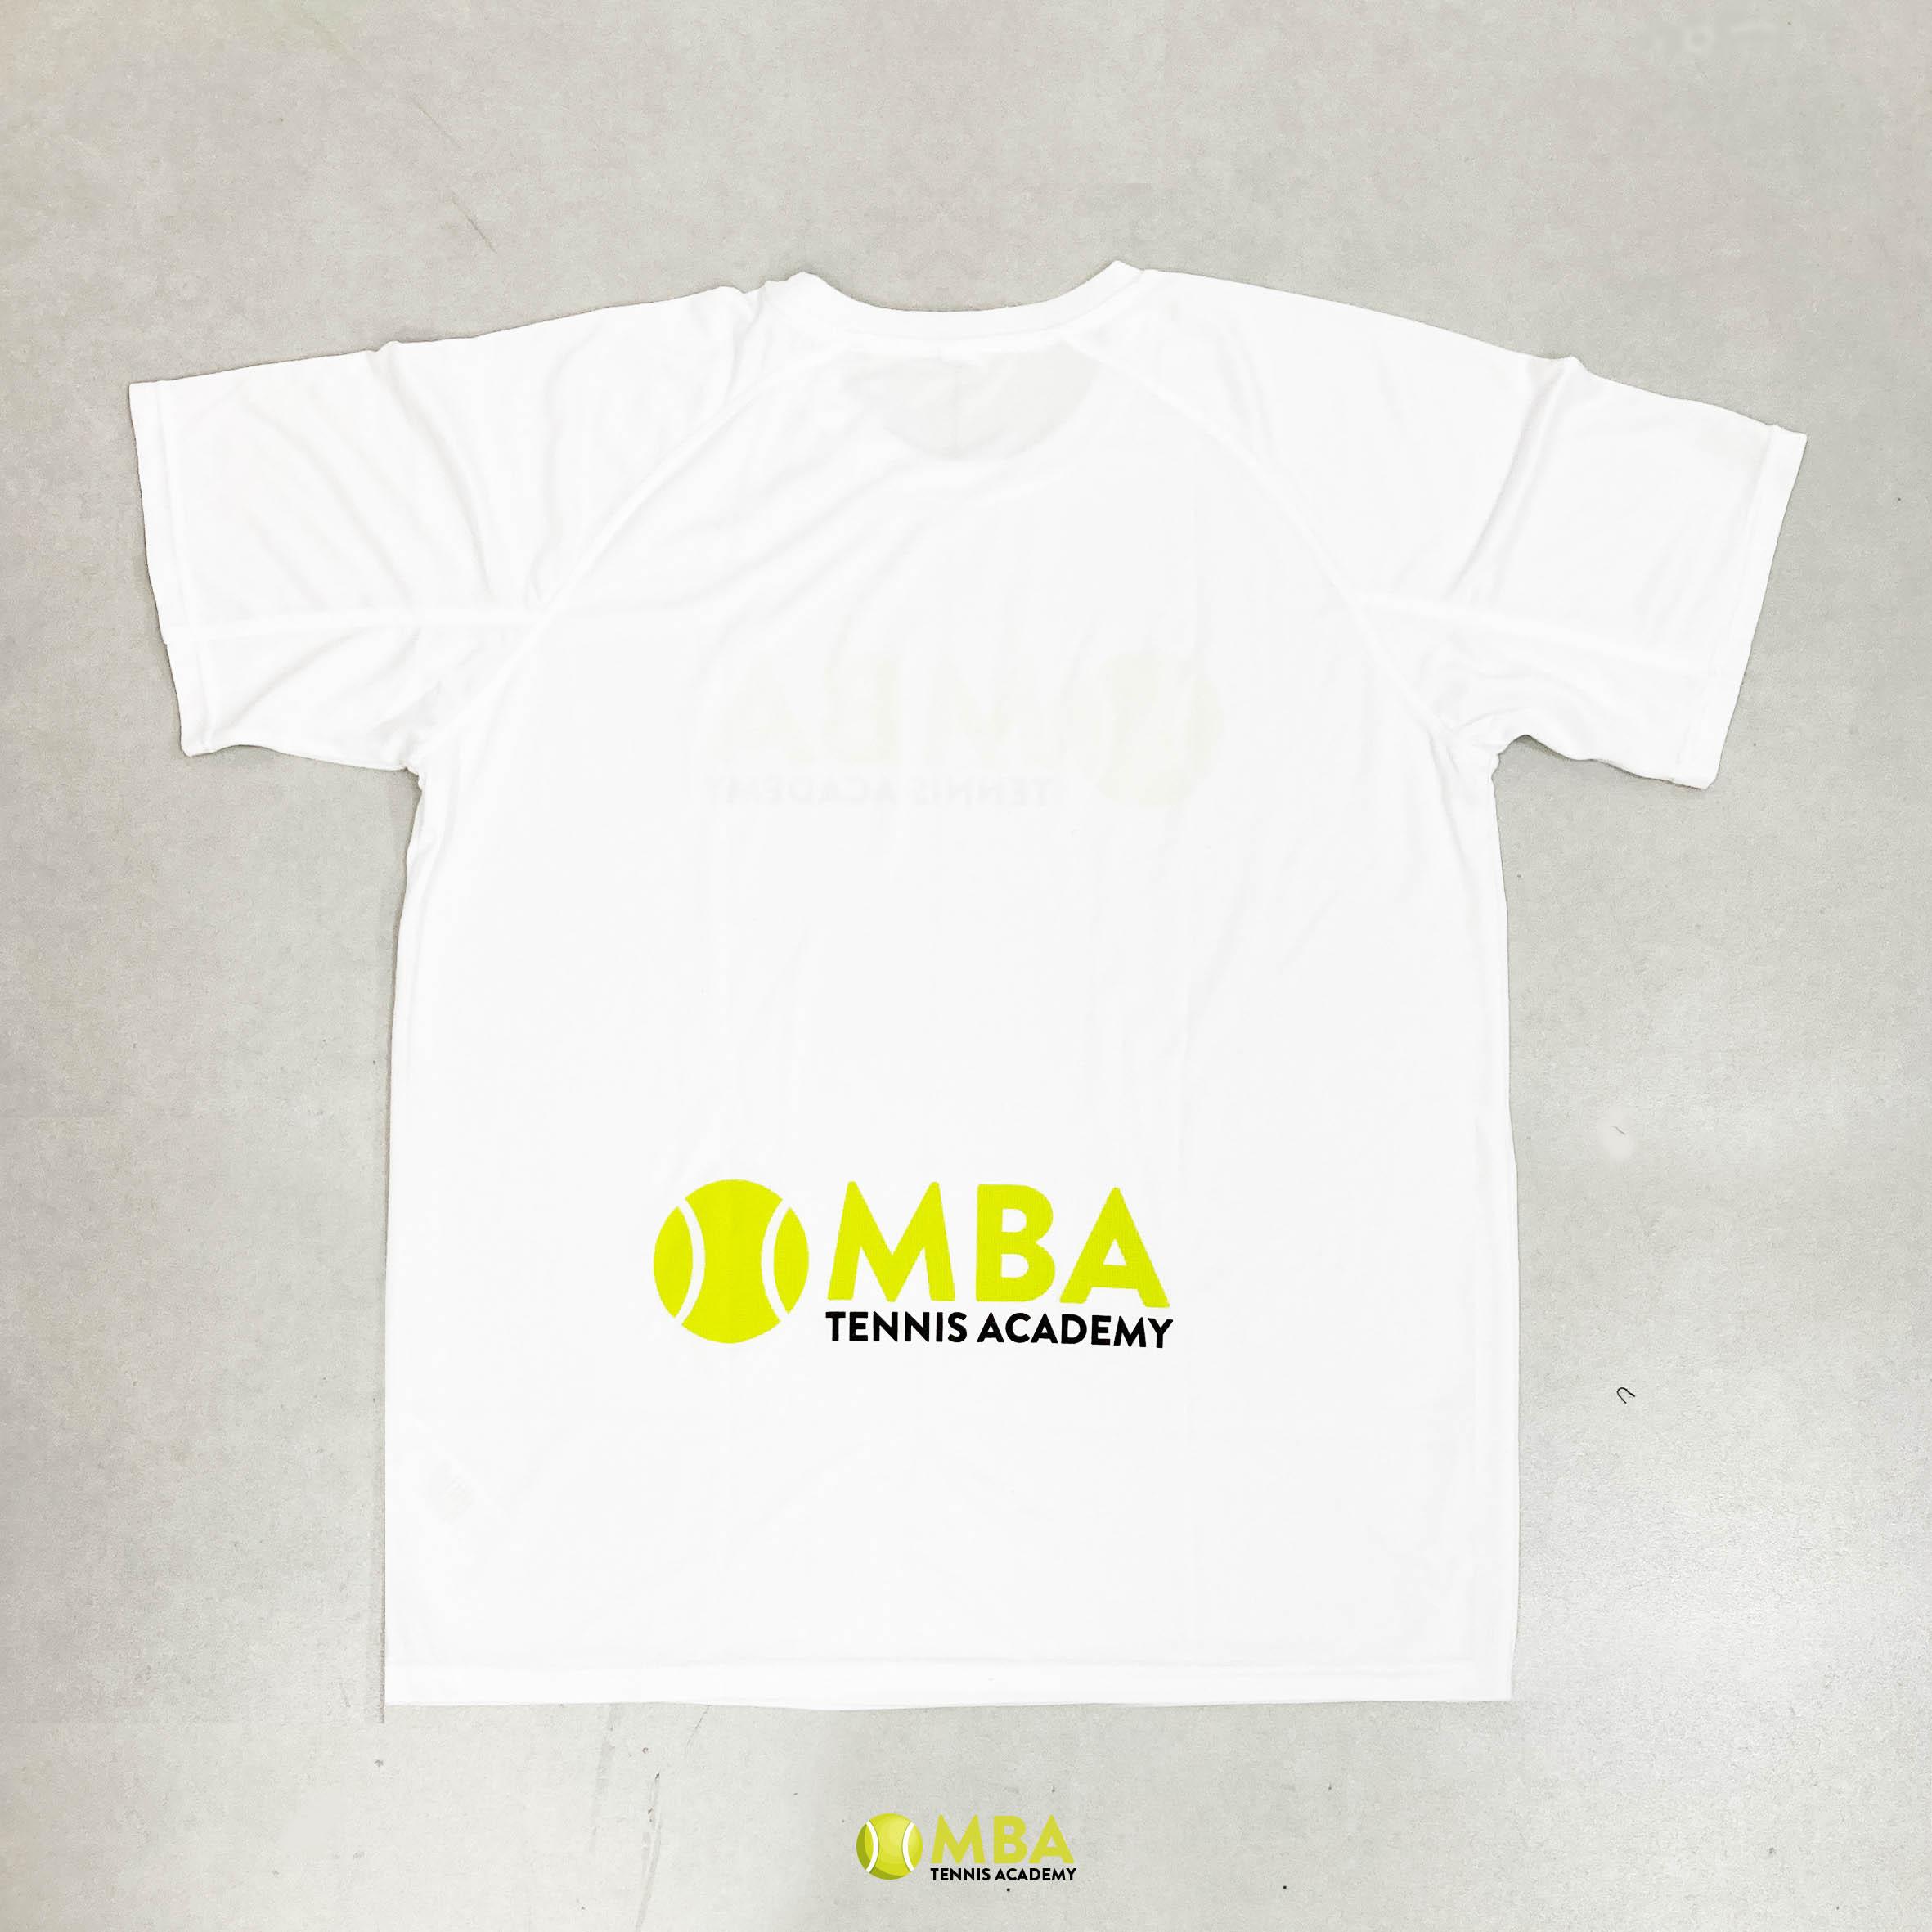 MBA-Tennis-Academy-camiseta-blanca-hombre-3